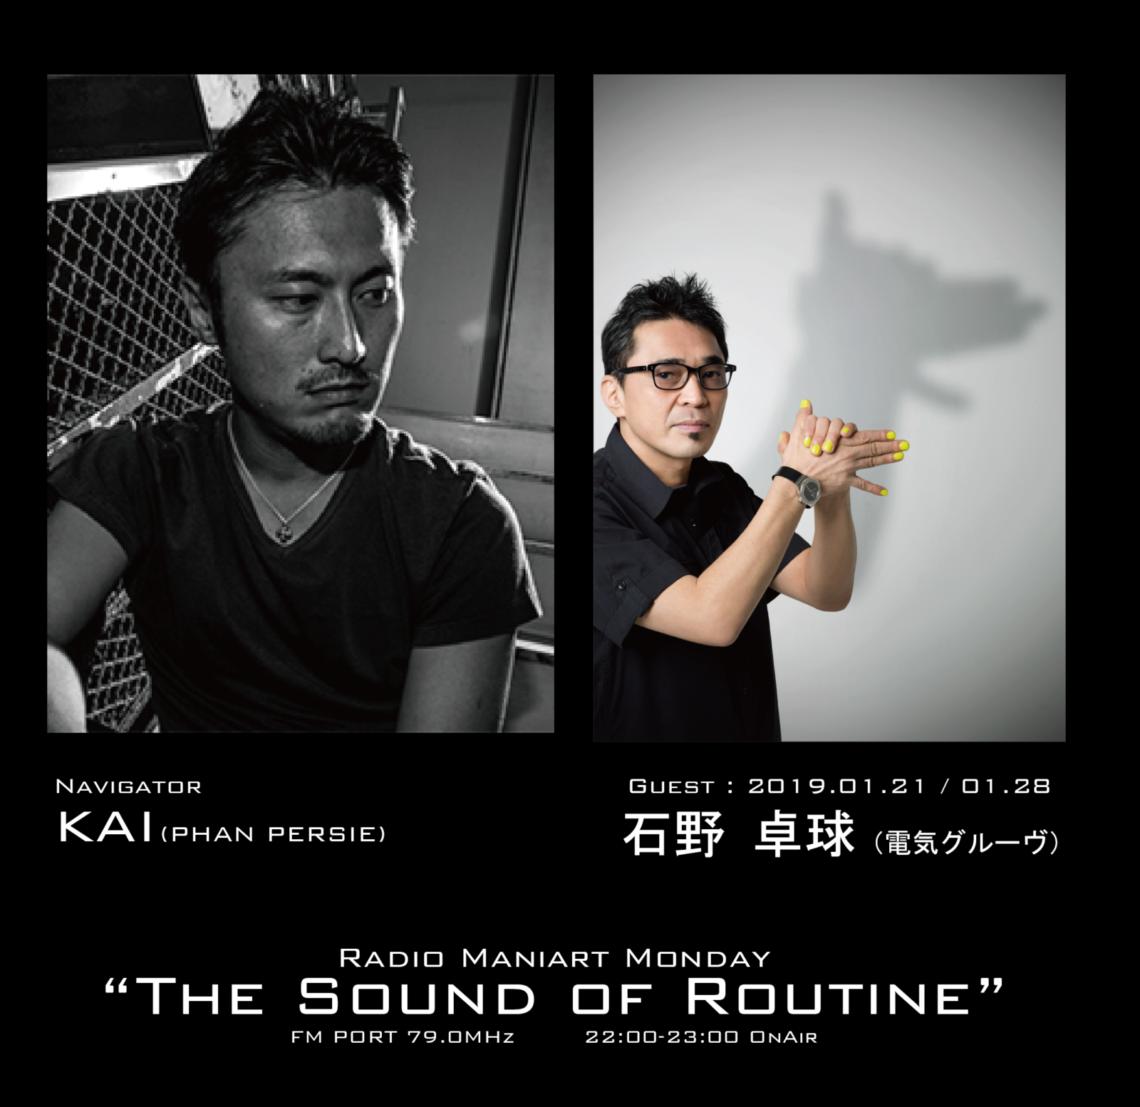 2019.1.21 MON, 28 MON – KAI : Navigator on FM PORT / the Sound of Routine – Guest: 石野卓球(電気グルーヴ)